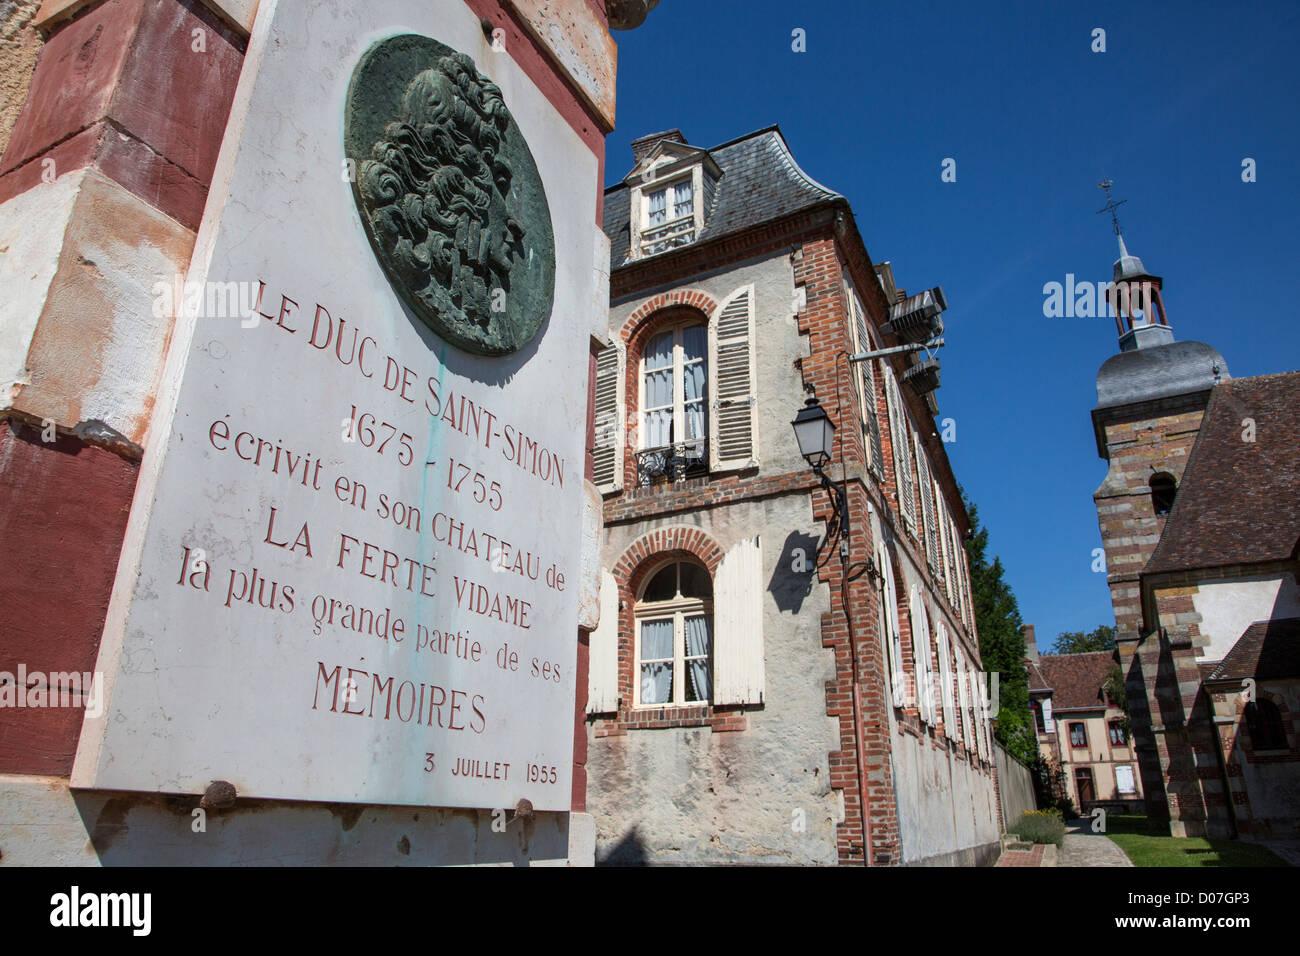 STELE IN MEMORY OF THE DUKE DE SAINT-SIMON (1675-1755) LA FERTE-VIDAME EURE-ET-LOIR (28) FRANCE - Stock Image